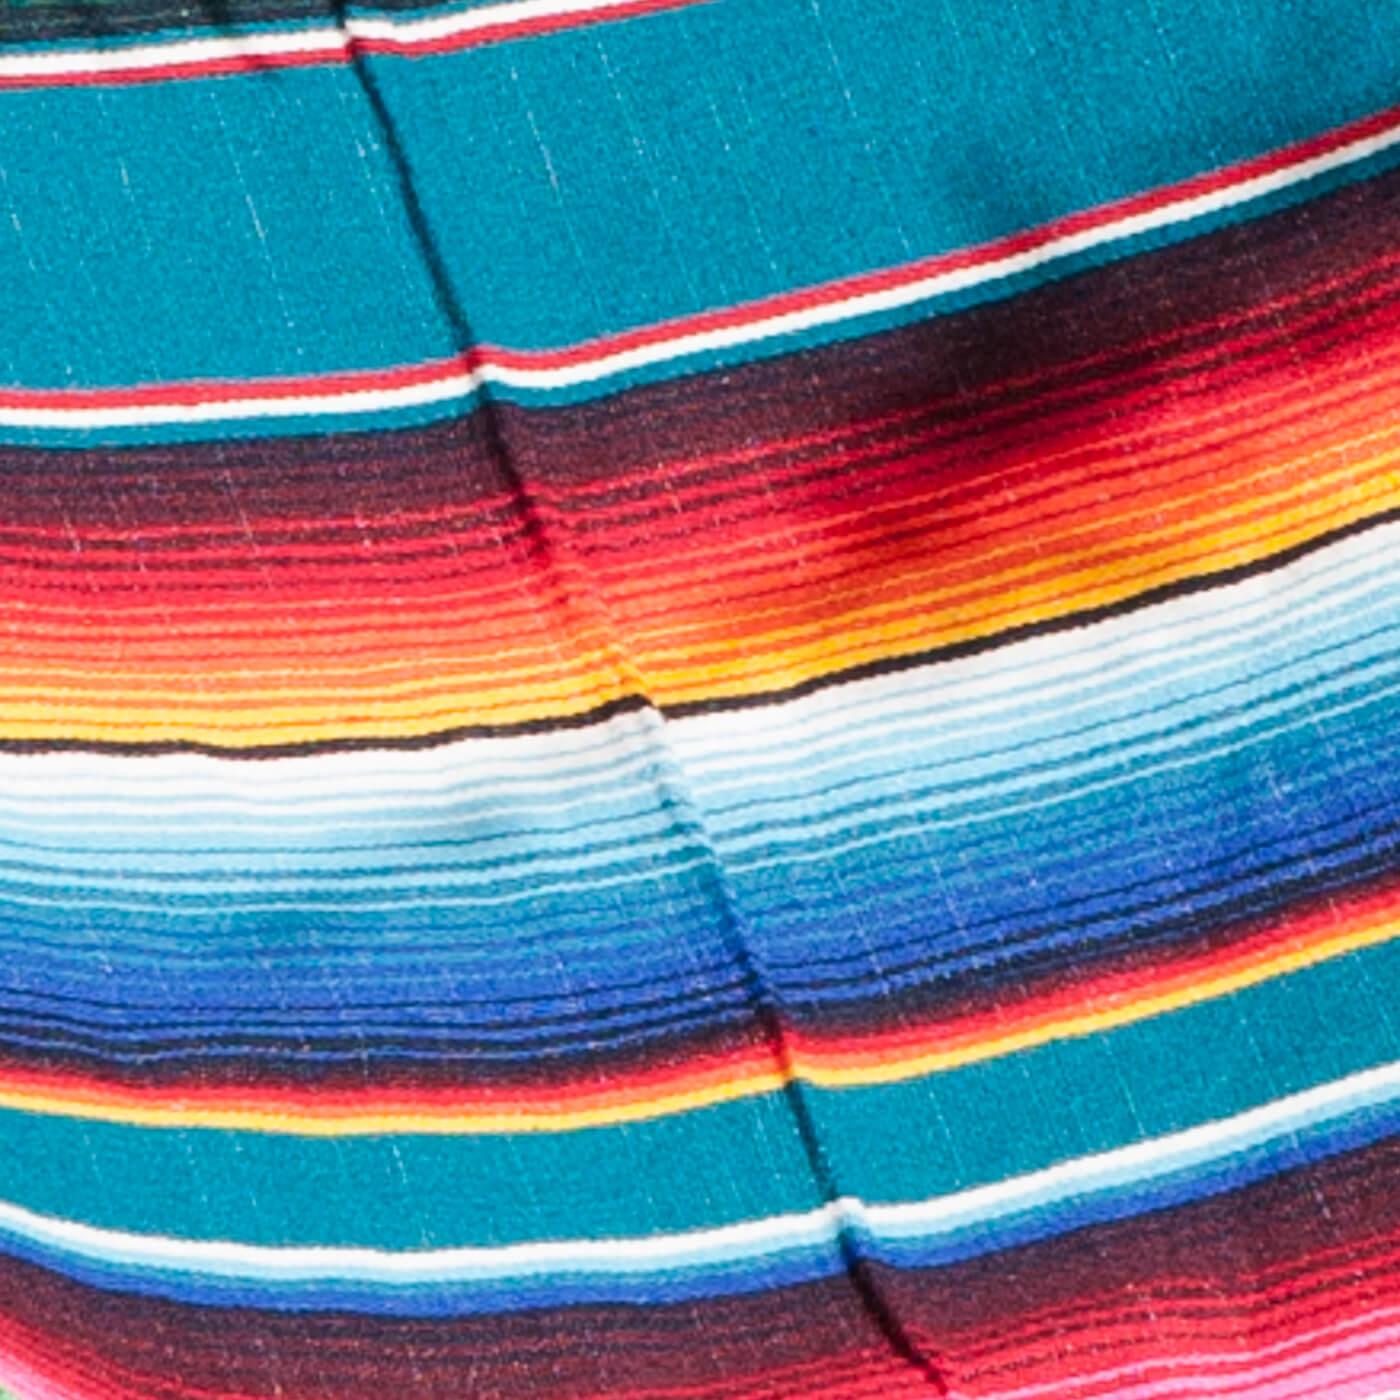 random colors nayeco to10006/ /tortuguera assortment